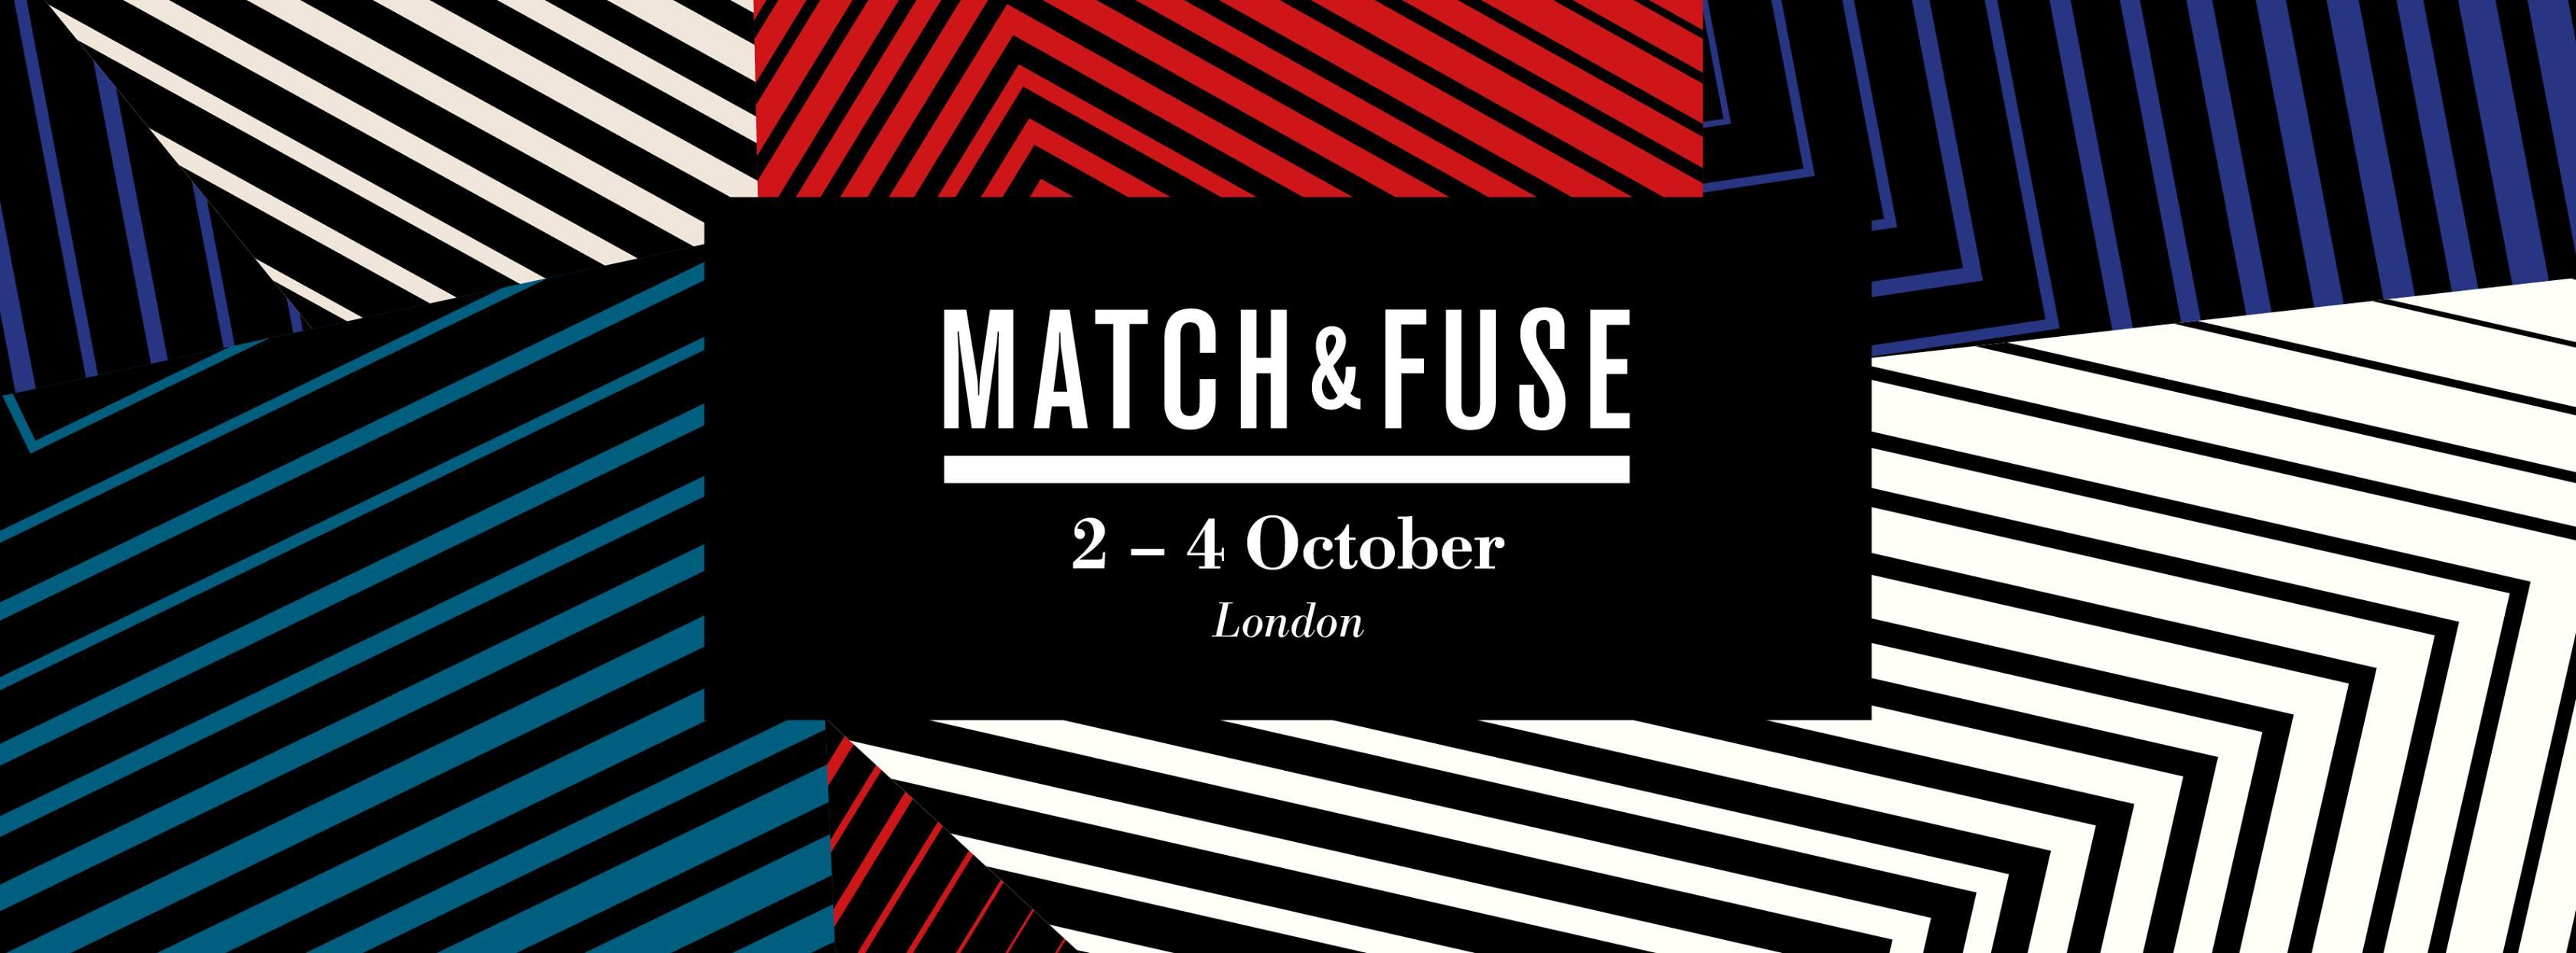 Match & Fuse